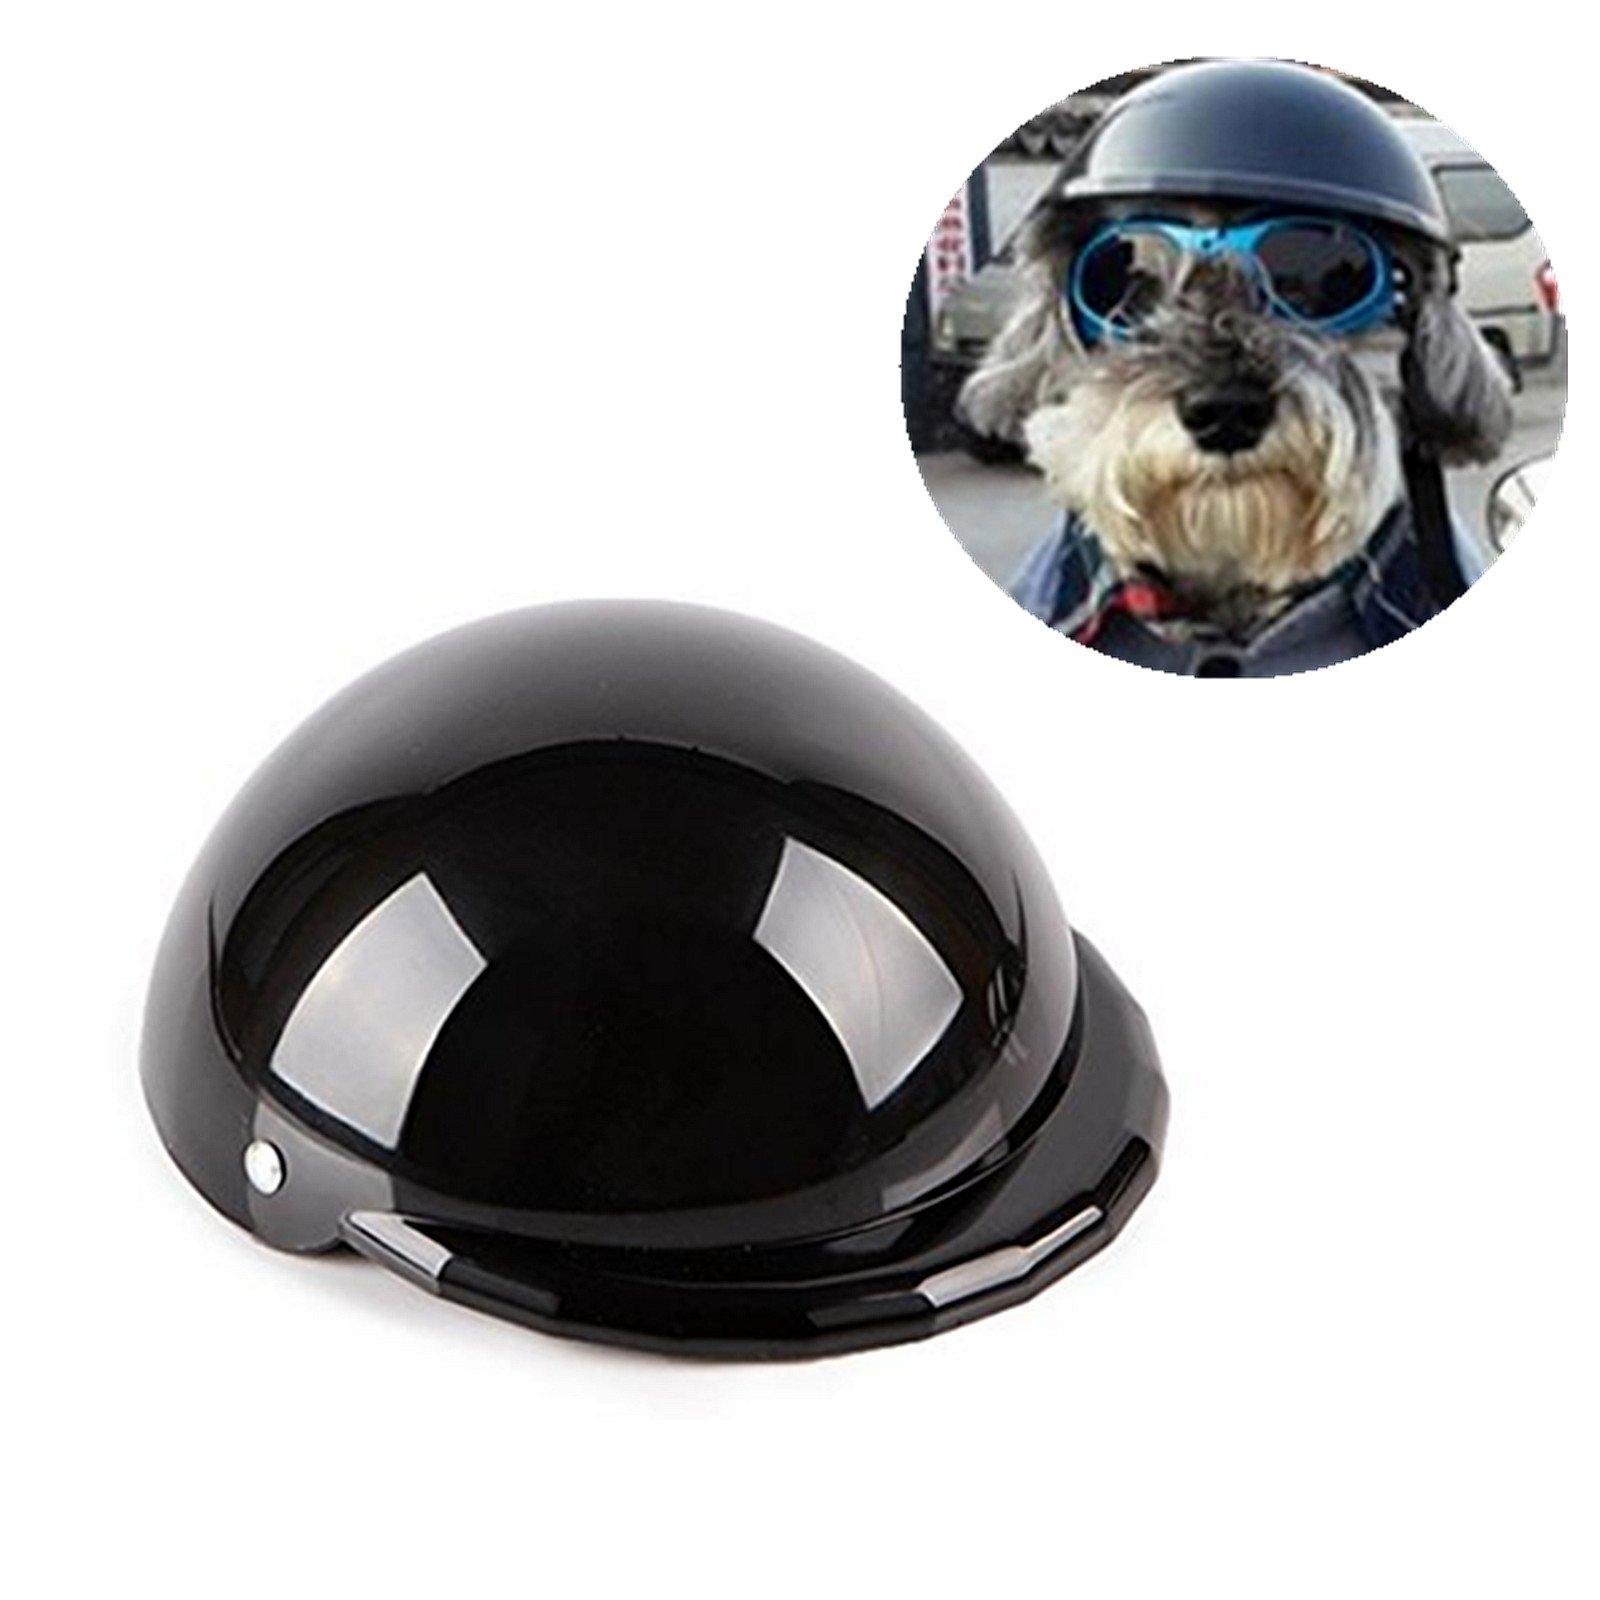 IAMUQ Dog Helmet, Cool Black Pet Hat Funny Dog Helmet for Sun Rain Protection Small Medium Costumes Accessories - MMedium Costumes Accessories - M